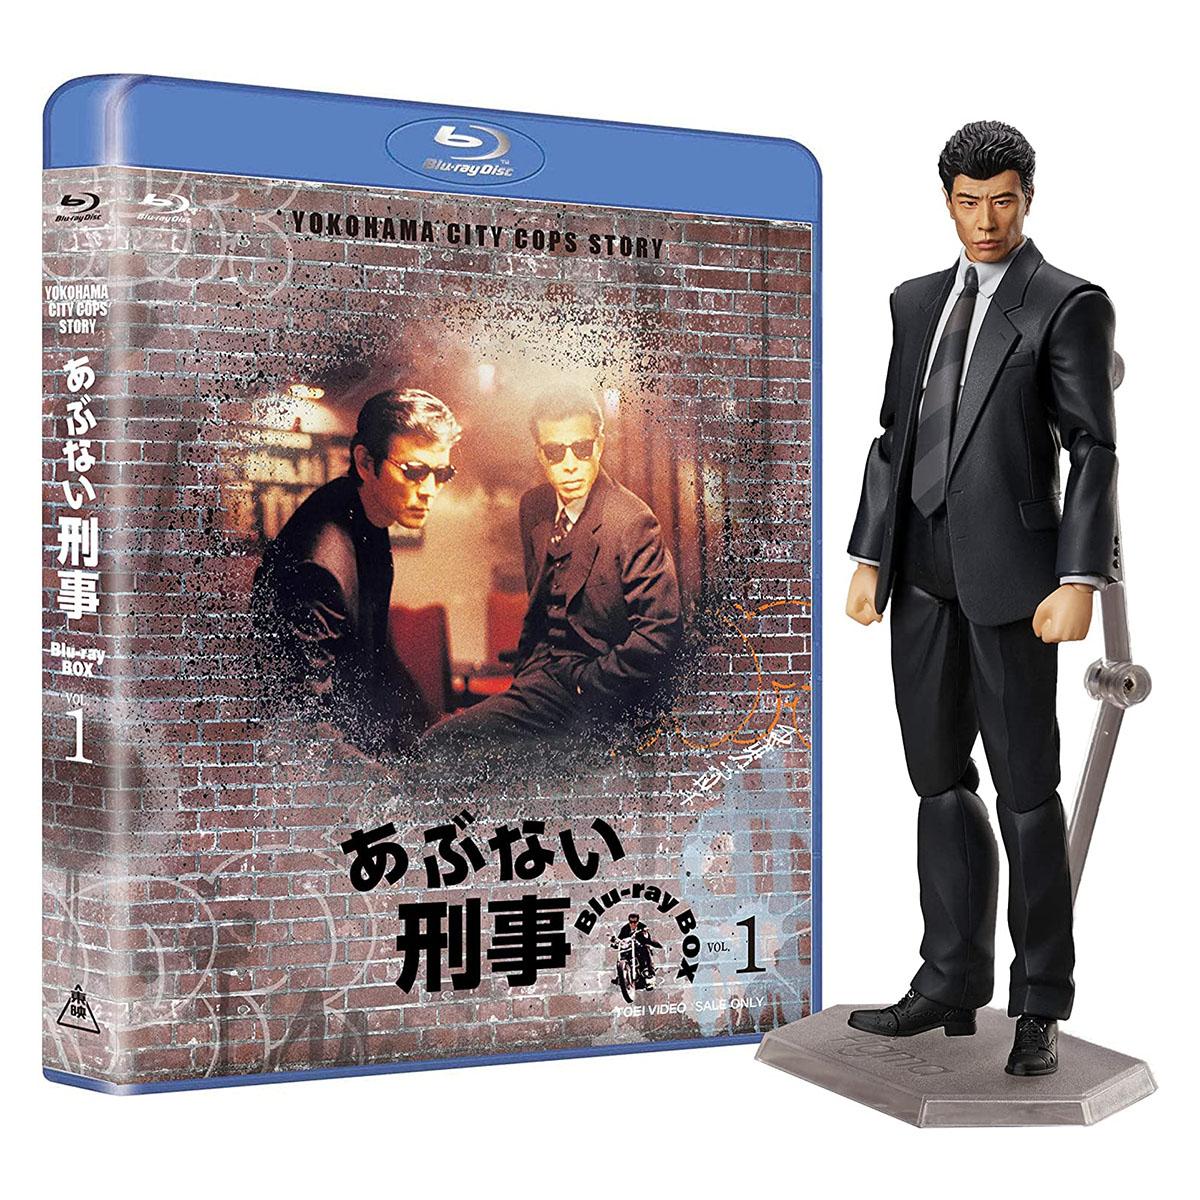 【DB】あぶない刑事 Blu-ray BOX VOL,1『タカフィギュア付き』完全予約限定生産-017